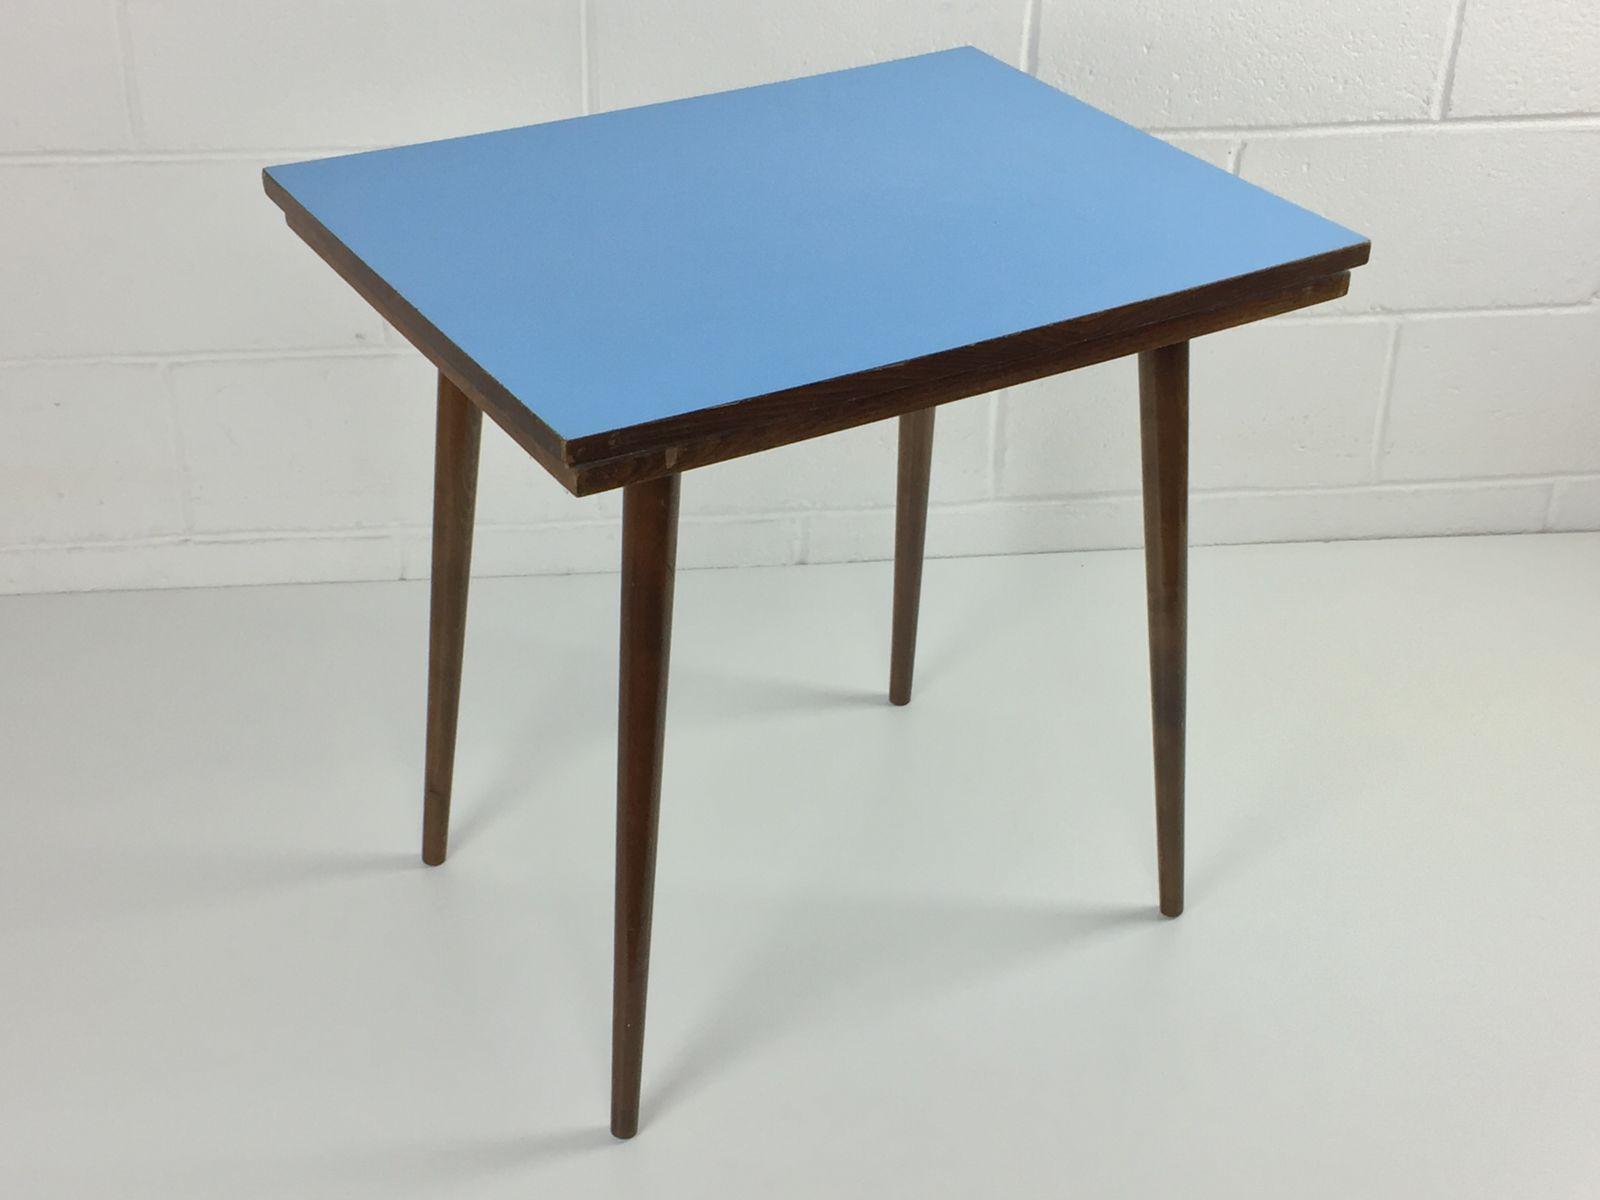 Mid Century Czech Beech Blue Formica Coffee Table From Tatra regarding size 1600 X 1200